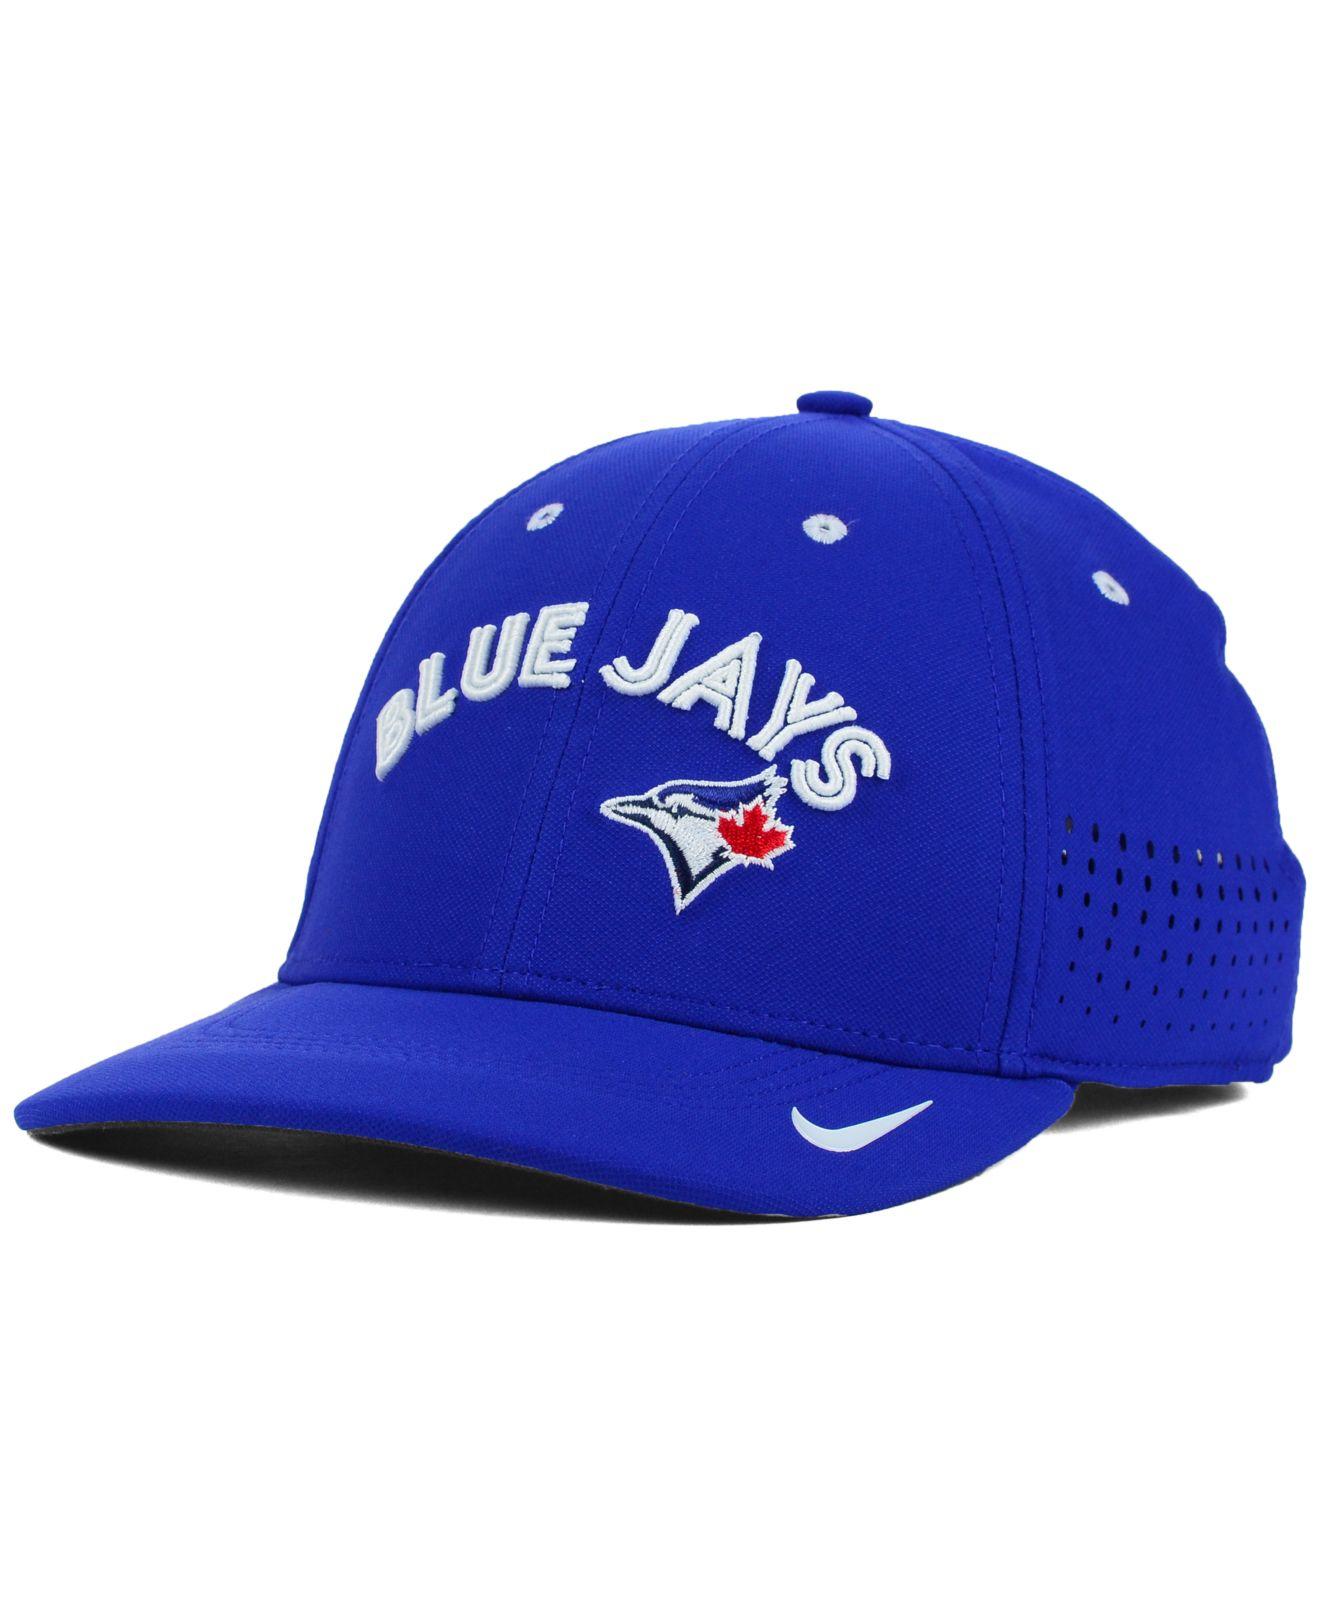 0443a94929b Lyst - Nike Toronto Blue Jays Vapor Swoosh Flex Cap in Blue for Men